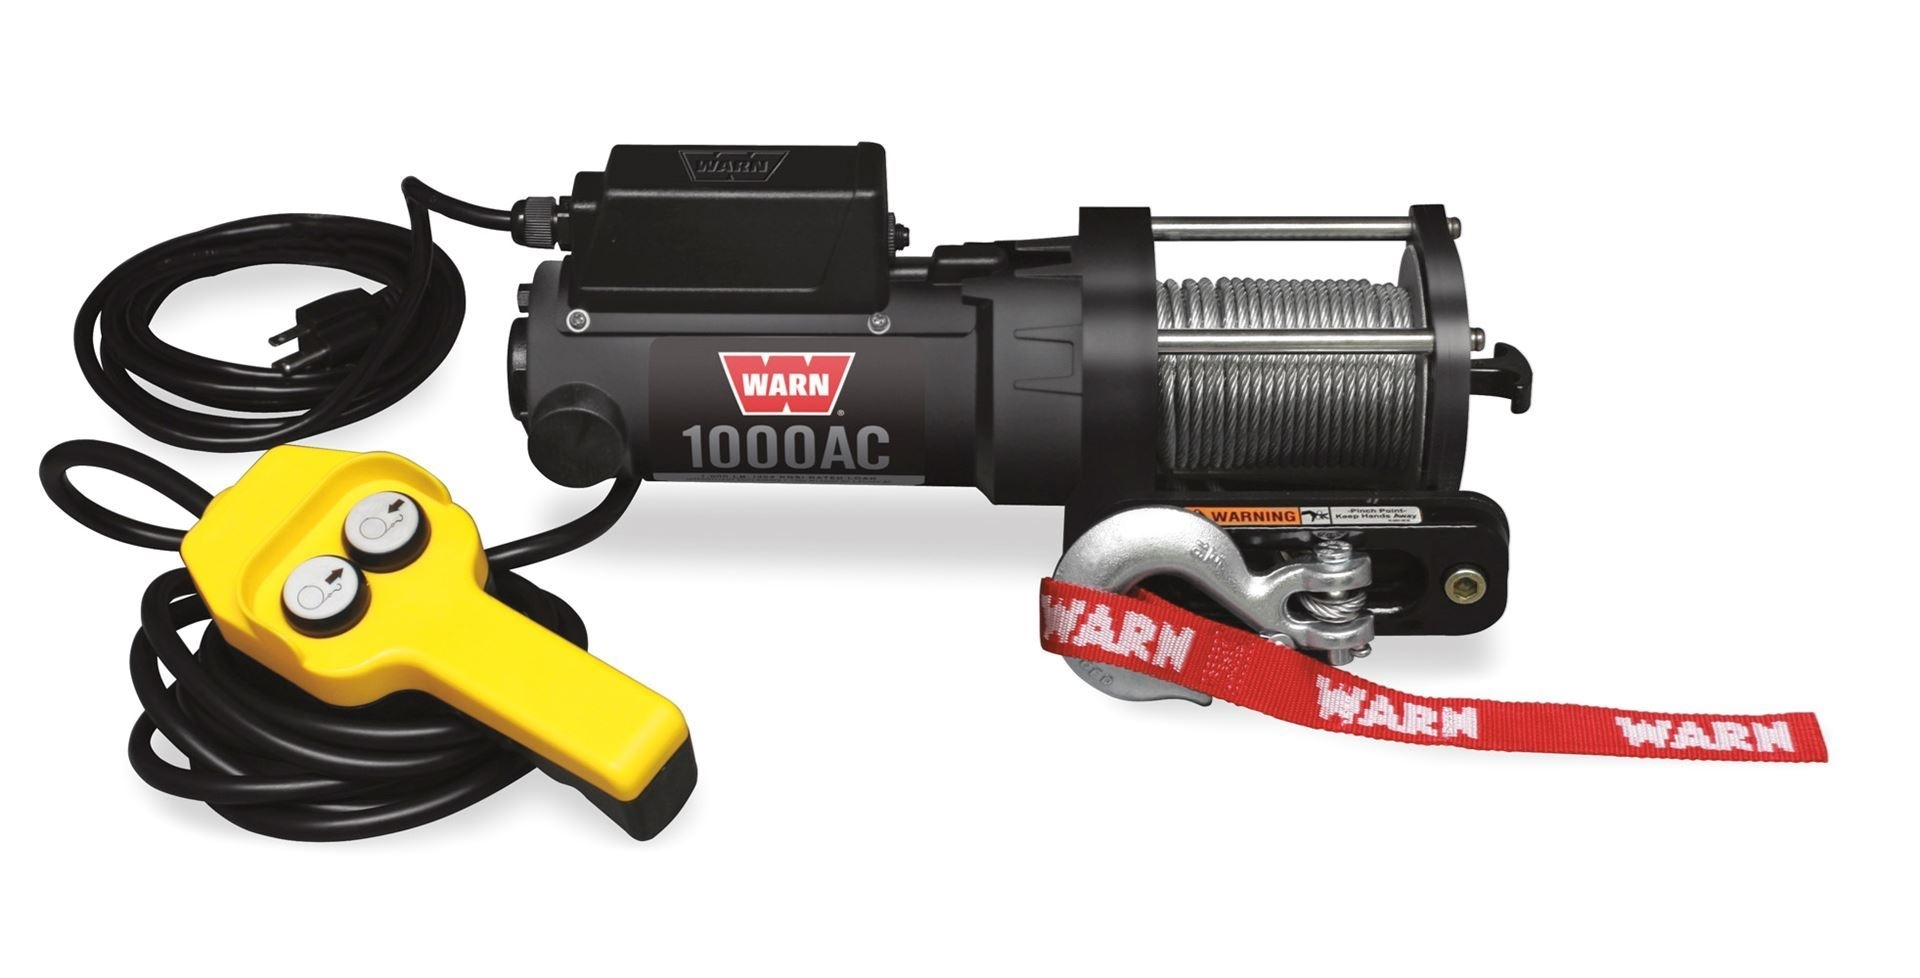 WARN Winches1000 AC 120V ELECTRIC WINCH - 80010